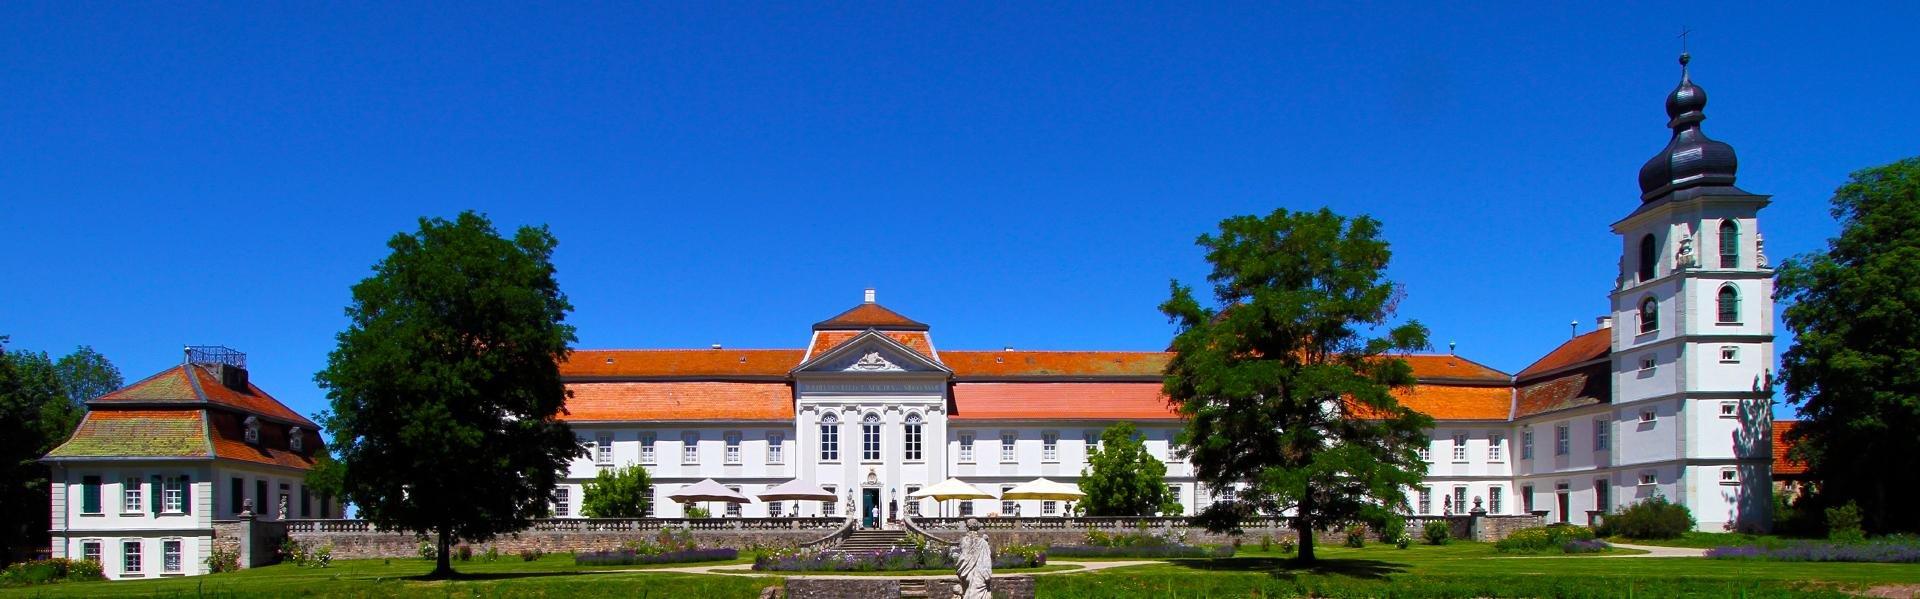 Schloss Fasanerie bij Fulda, Duitsland